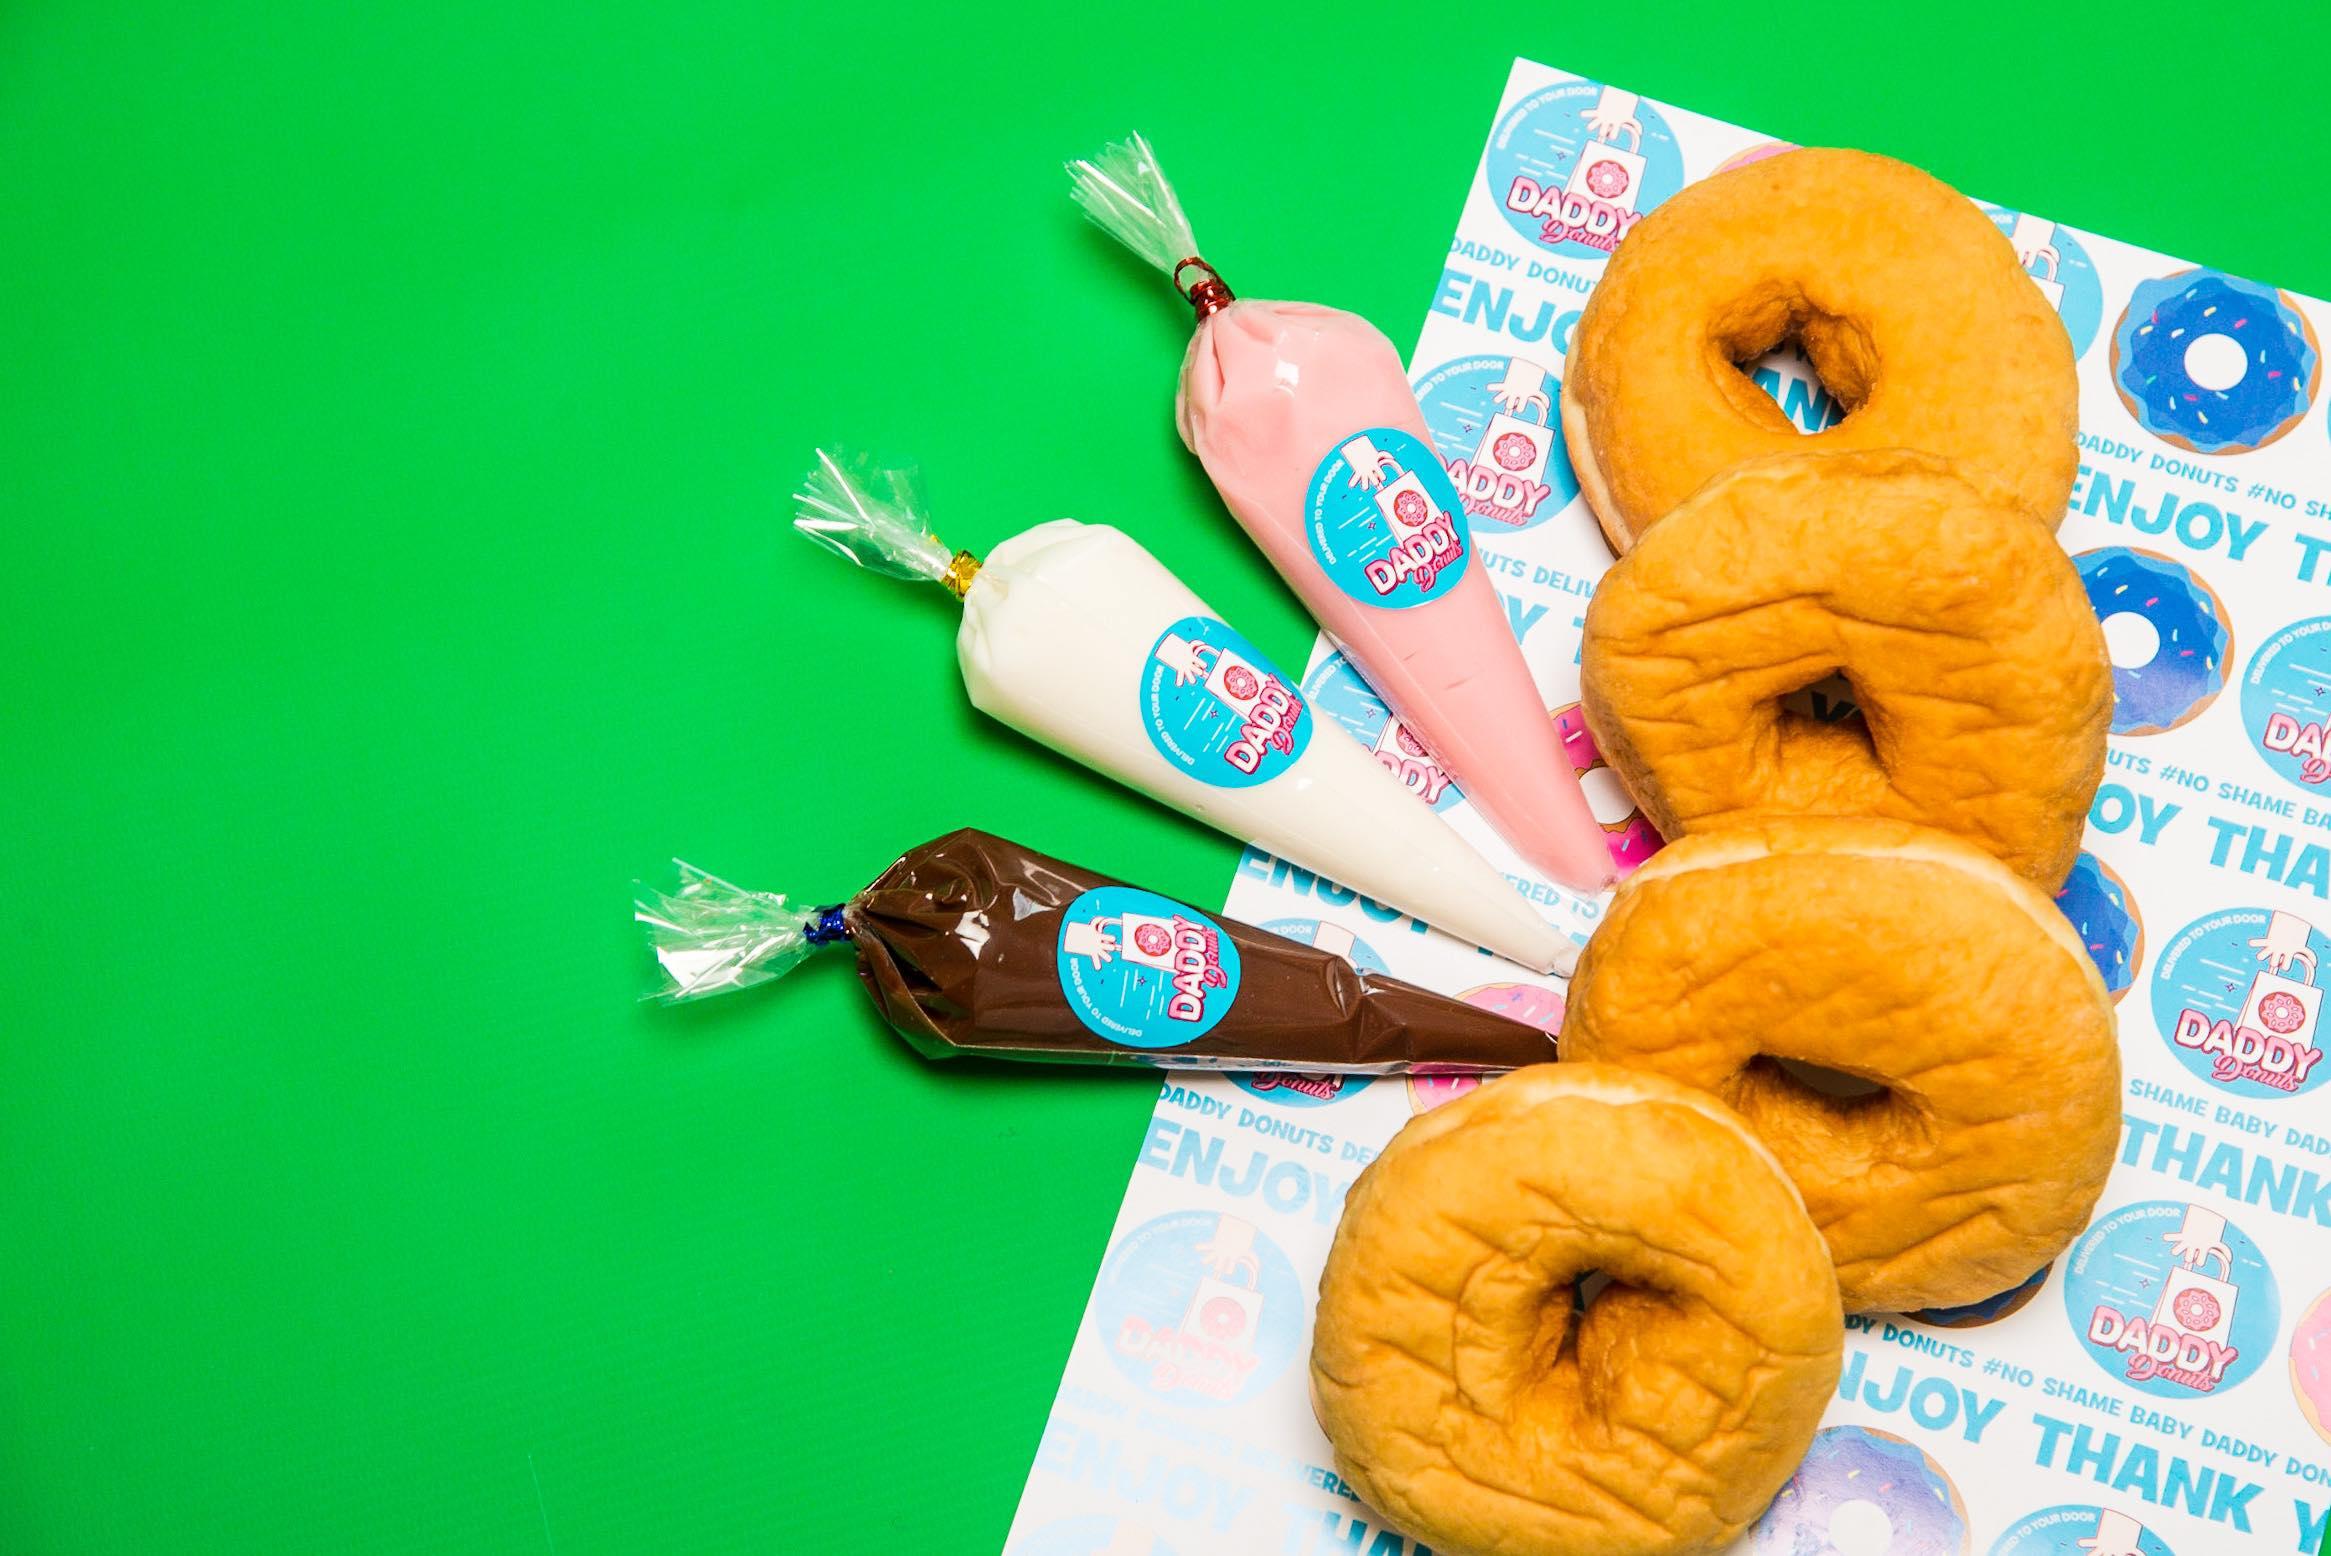 donuts delivered to your door diy kit